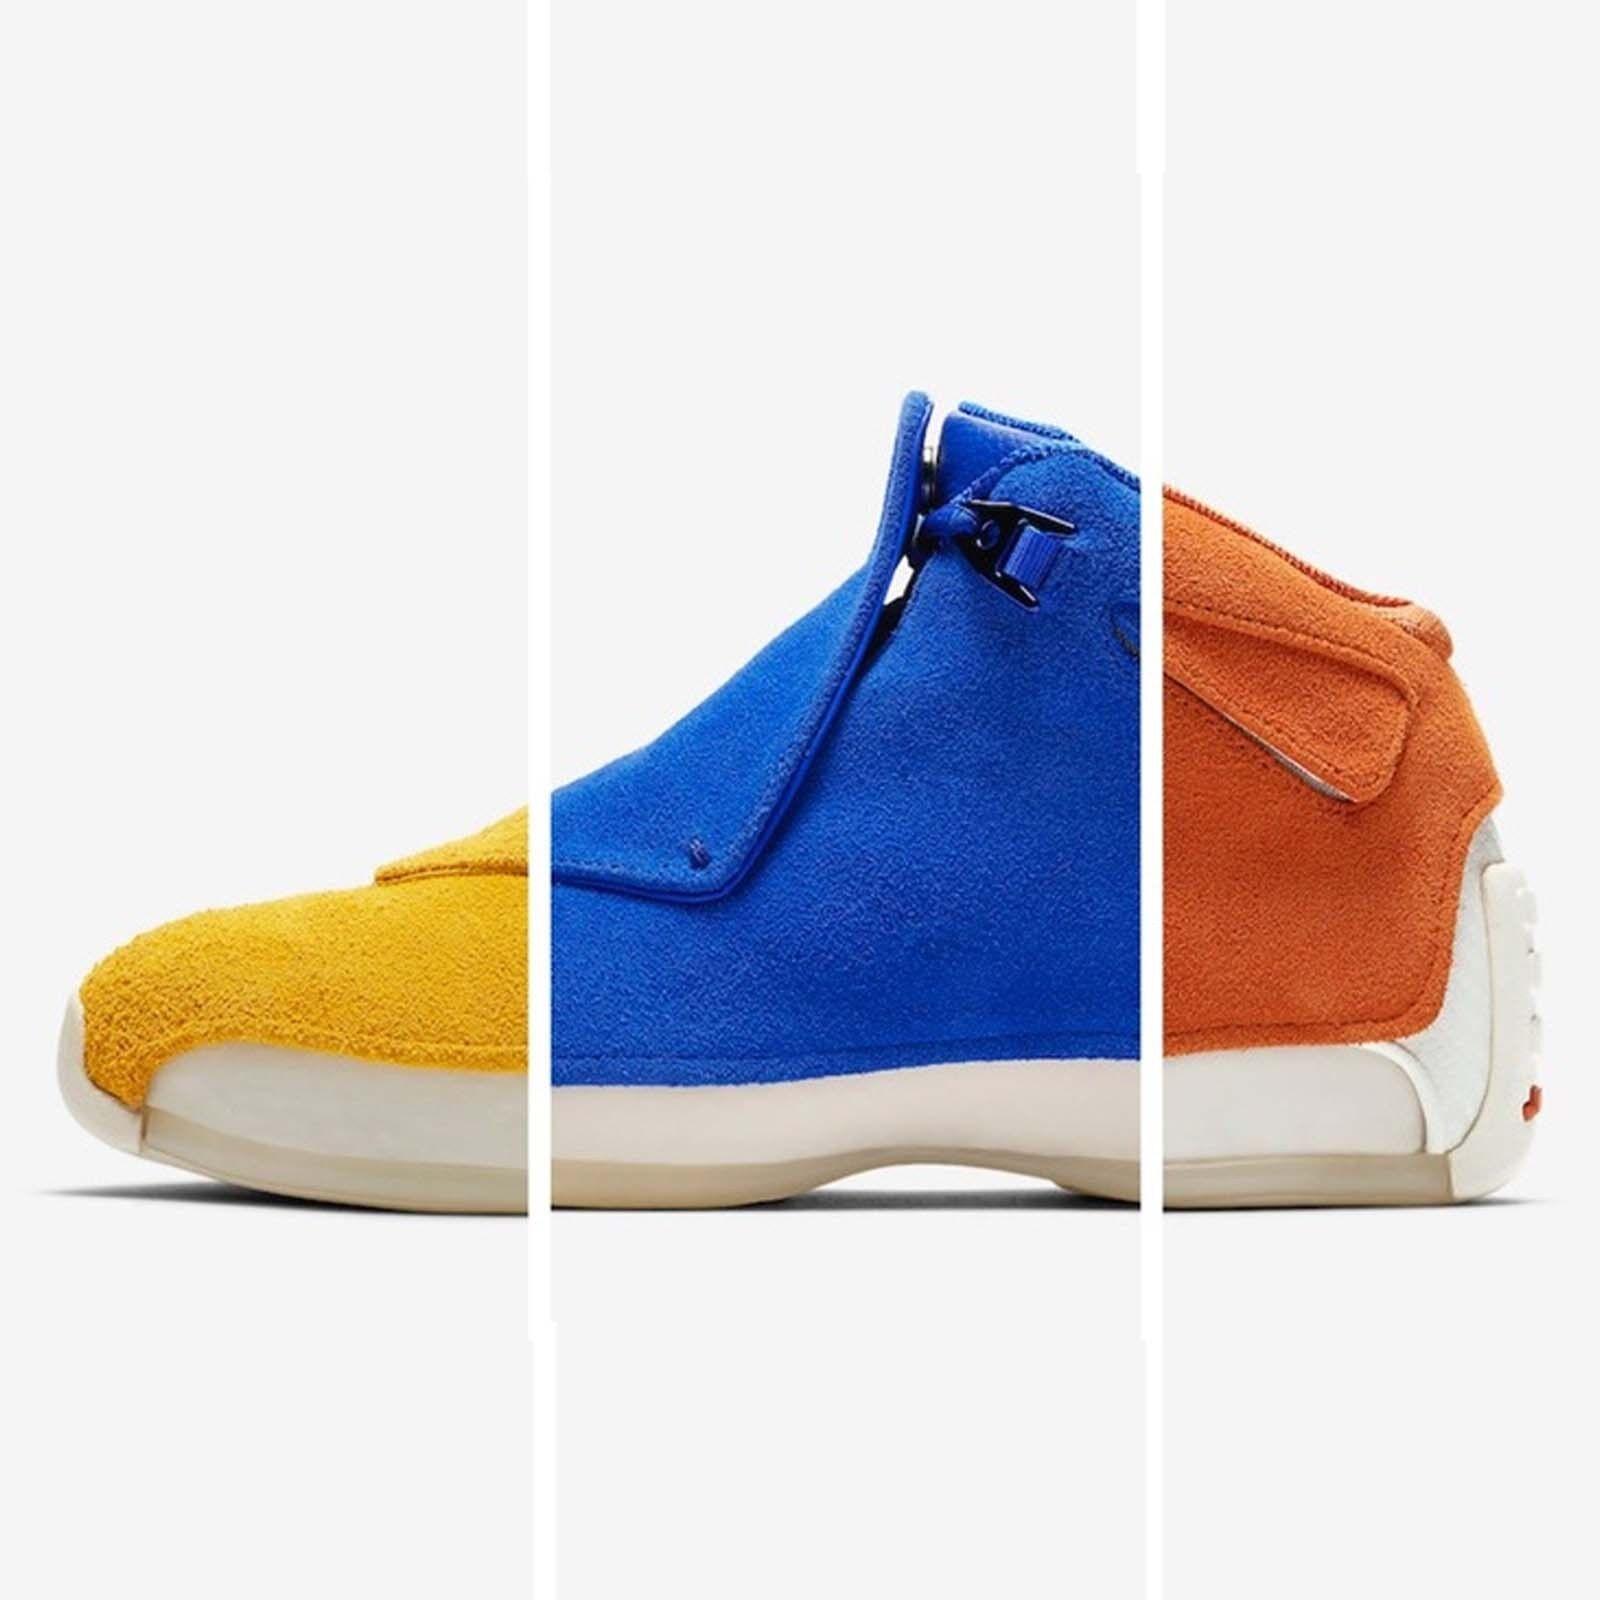 Nike Air Jordan 18 Retro Suede Yellow bluee orange Mens Basketball AJ18 Pick 1